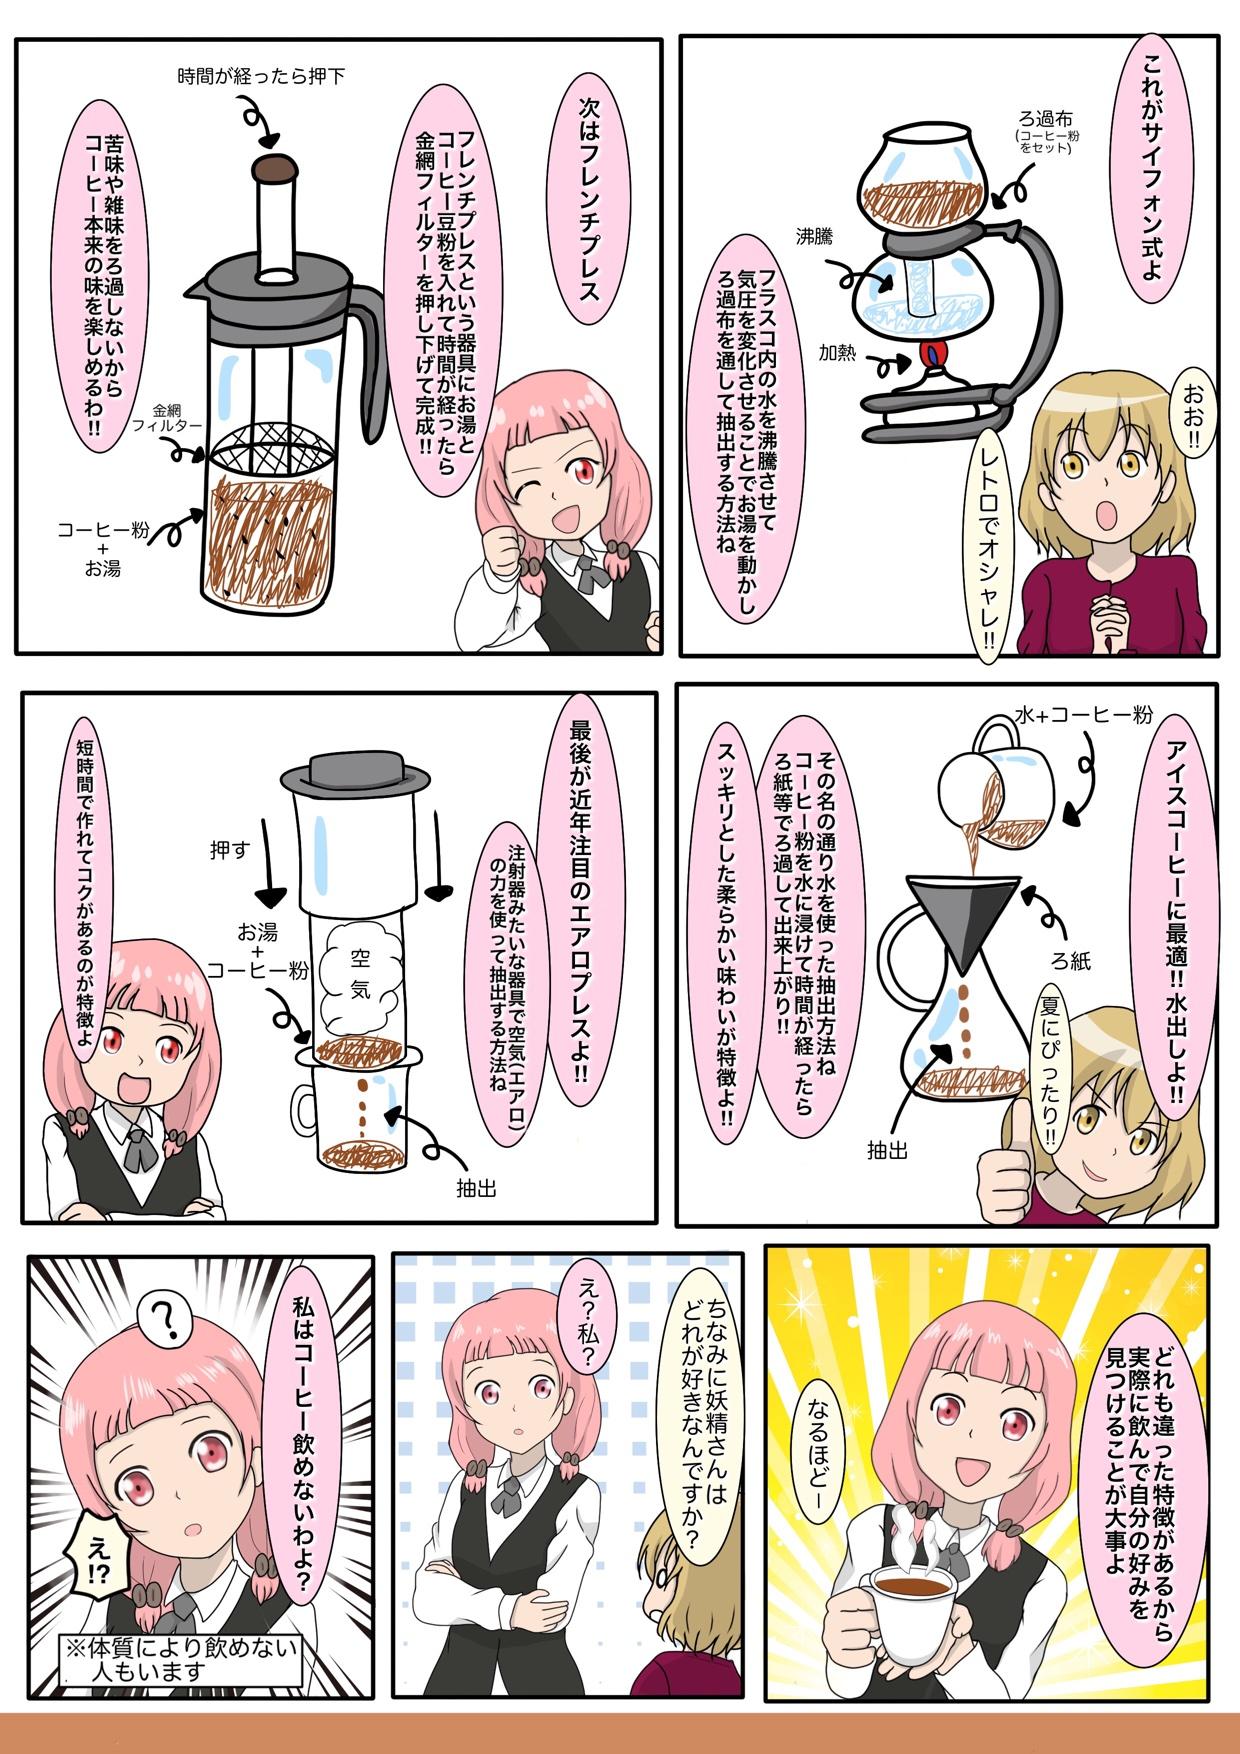 f:id:houmu_comic:20180820211326j:plain